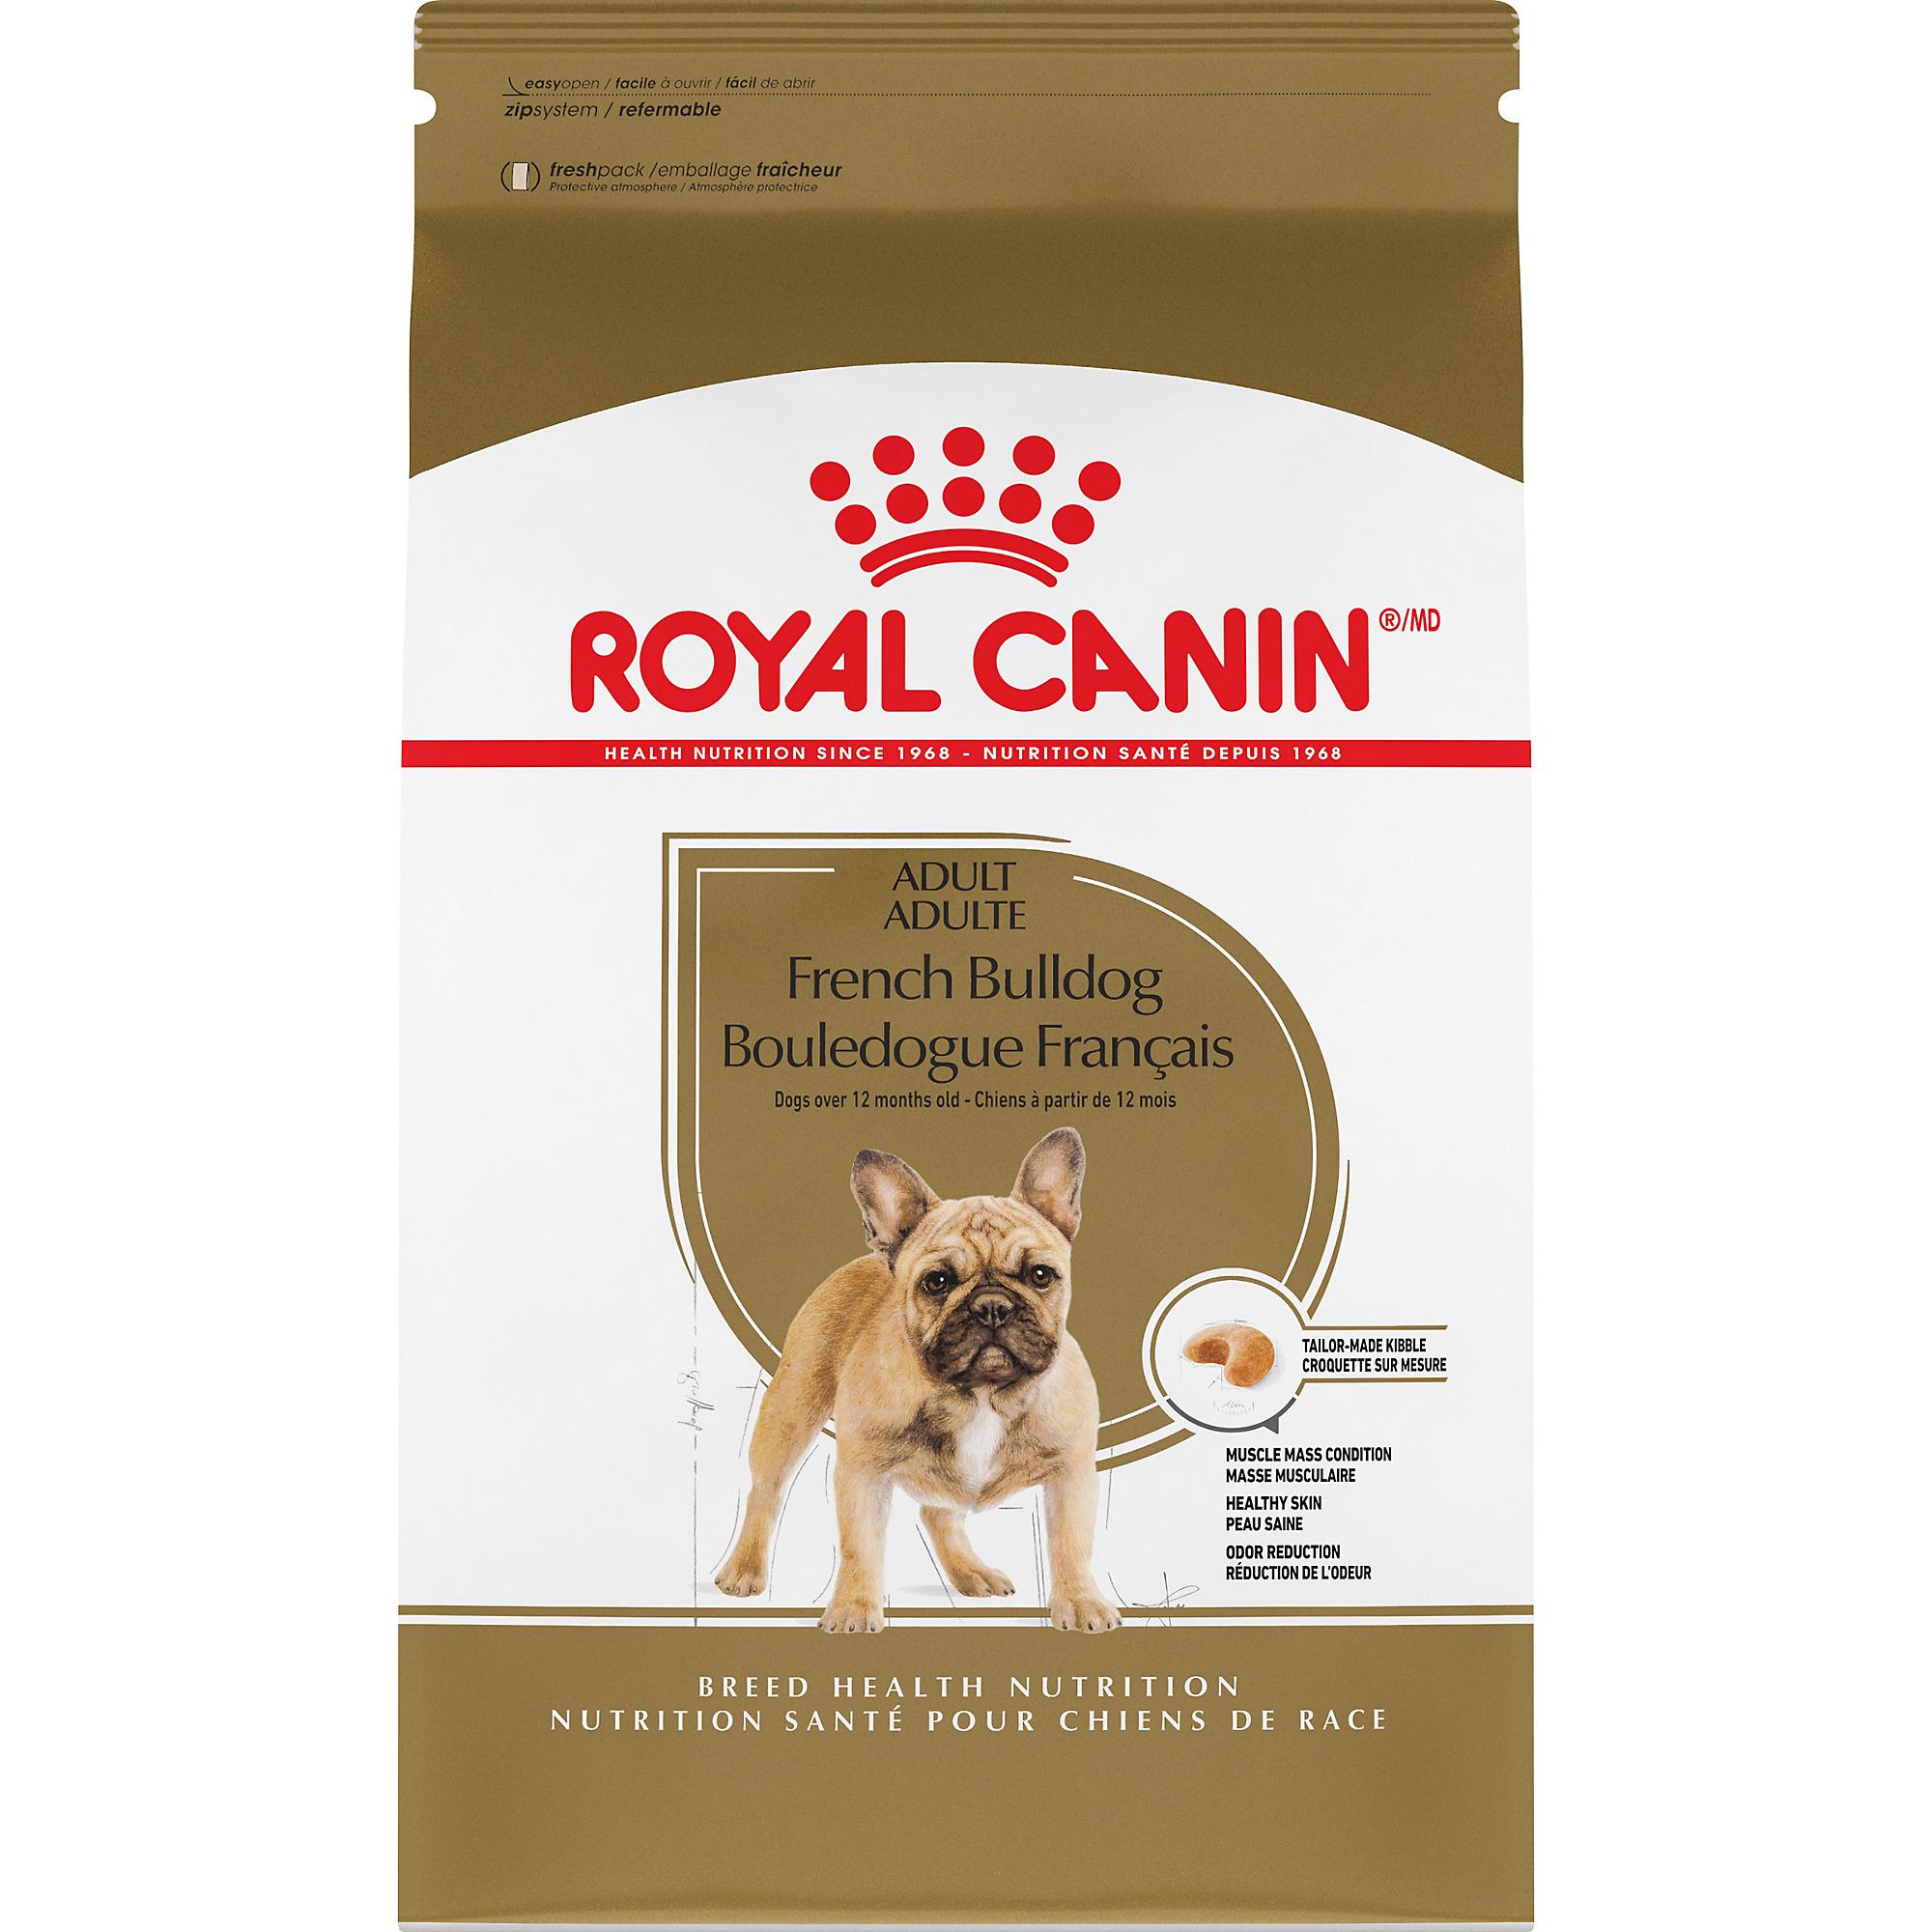 Royal Canin Breed Health Nutrition French Bulldog Adult Dry Dog Food Image